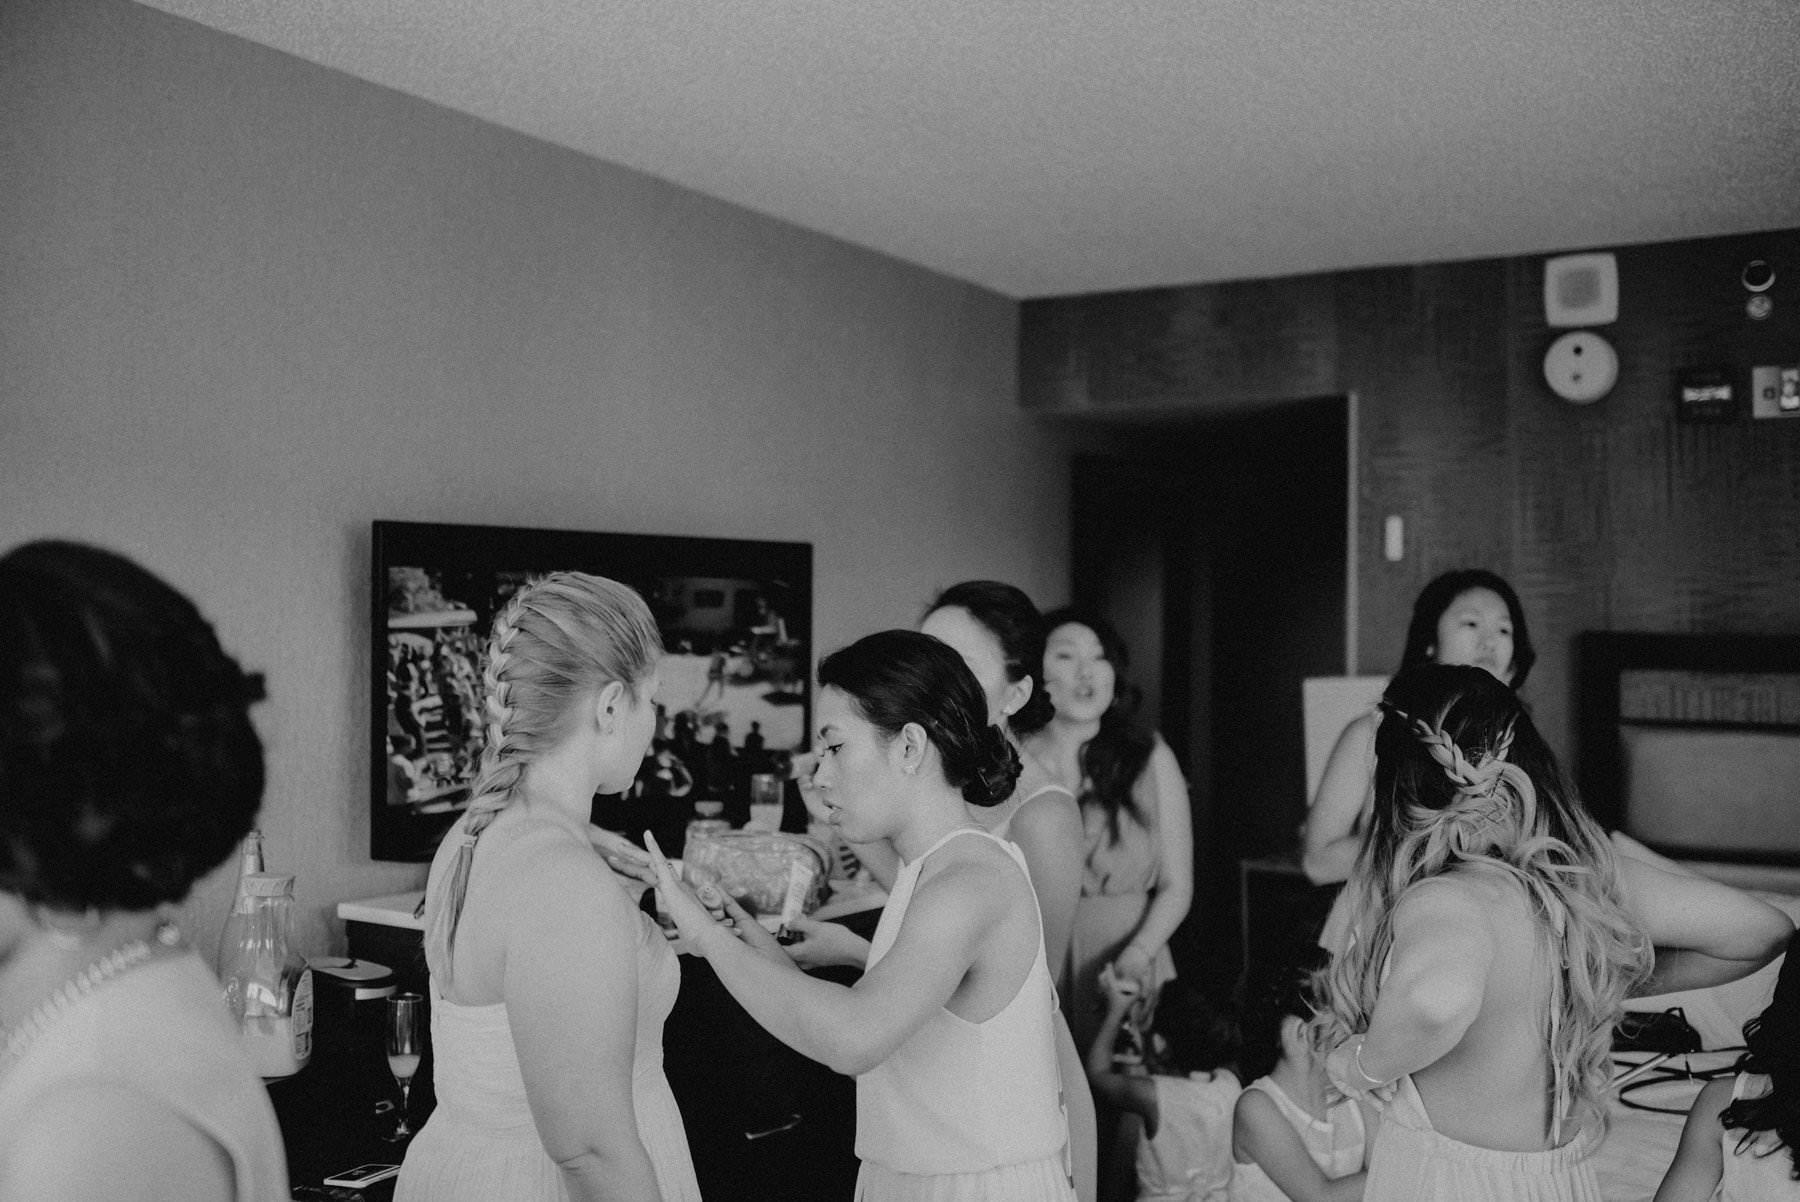 Appleford-estate-wedding-13.jpg